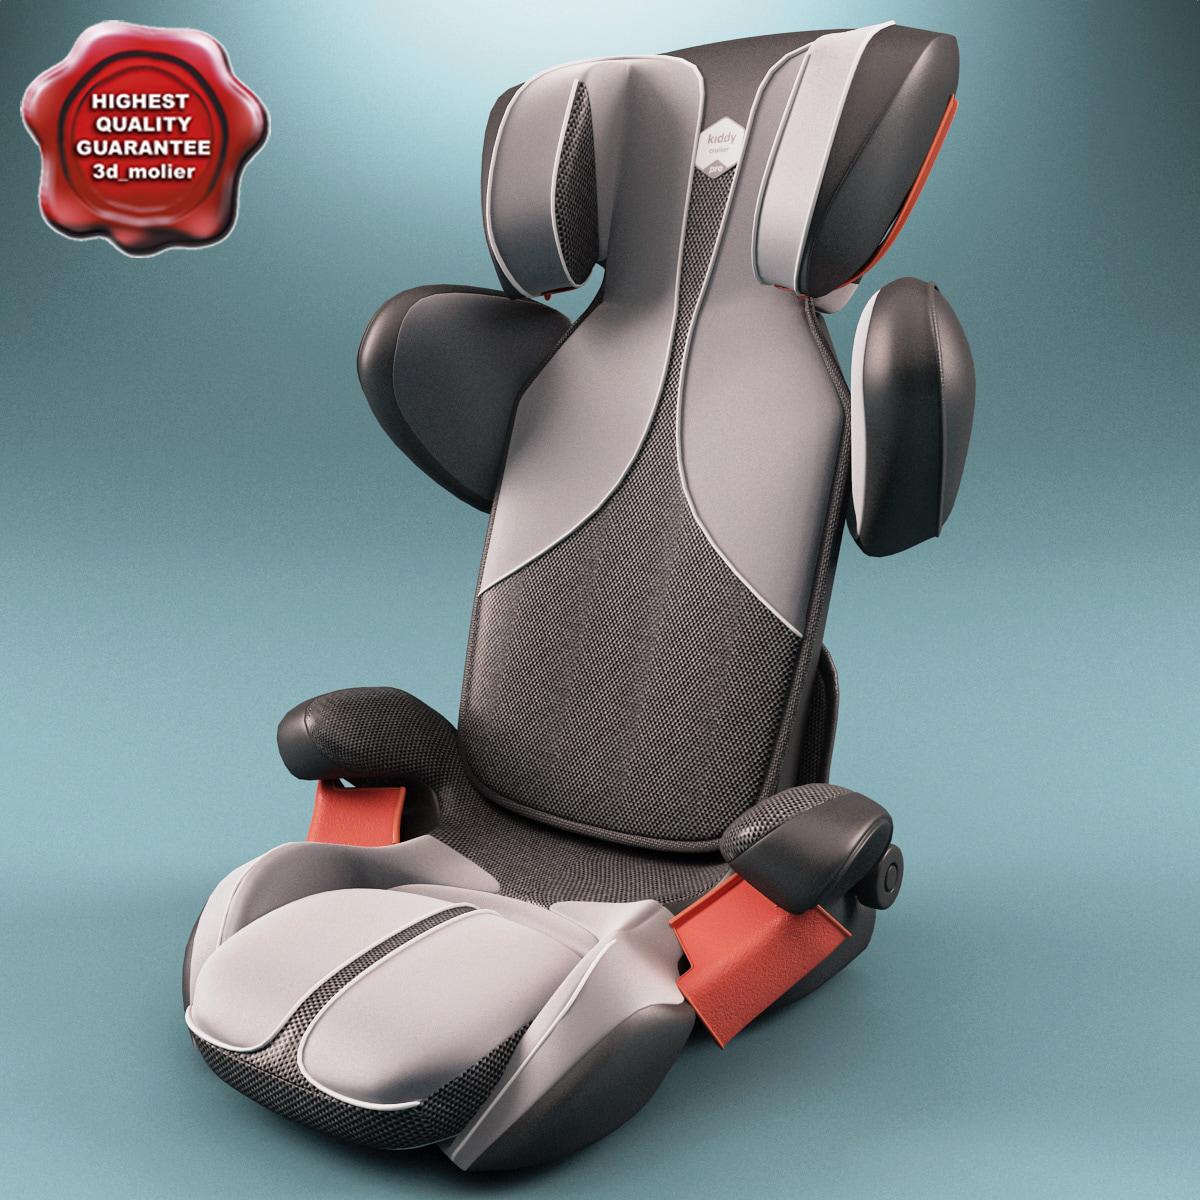 Kiddy_Car_Seat_Cruiser_Pro_00.jpg